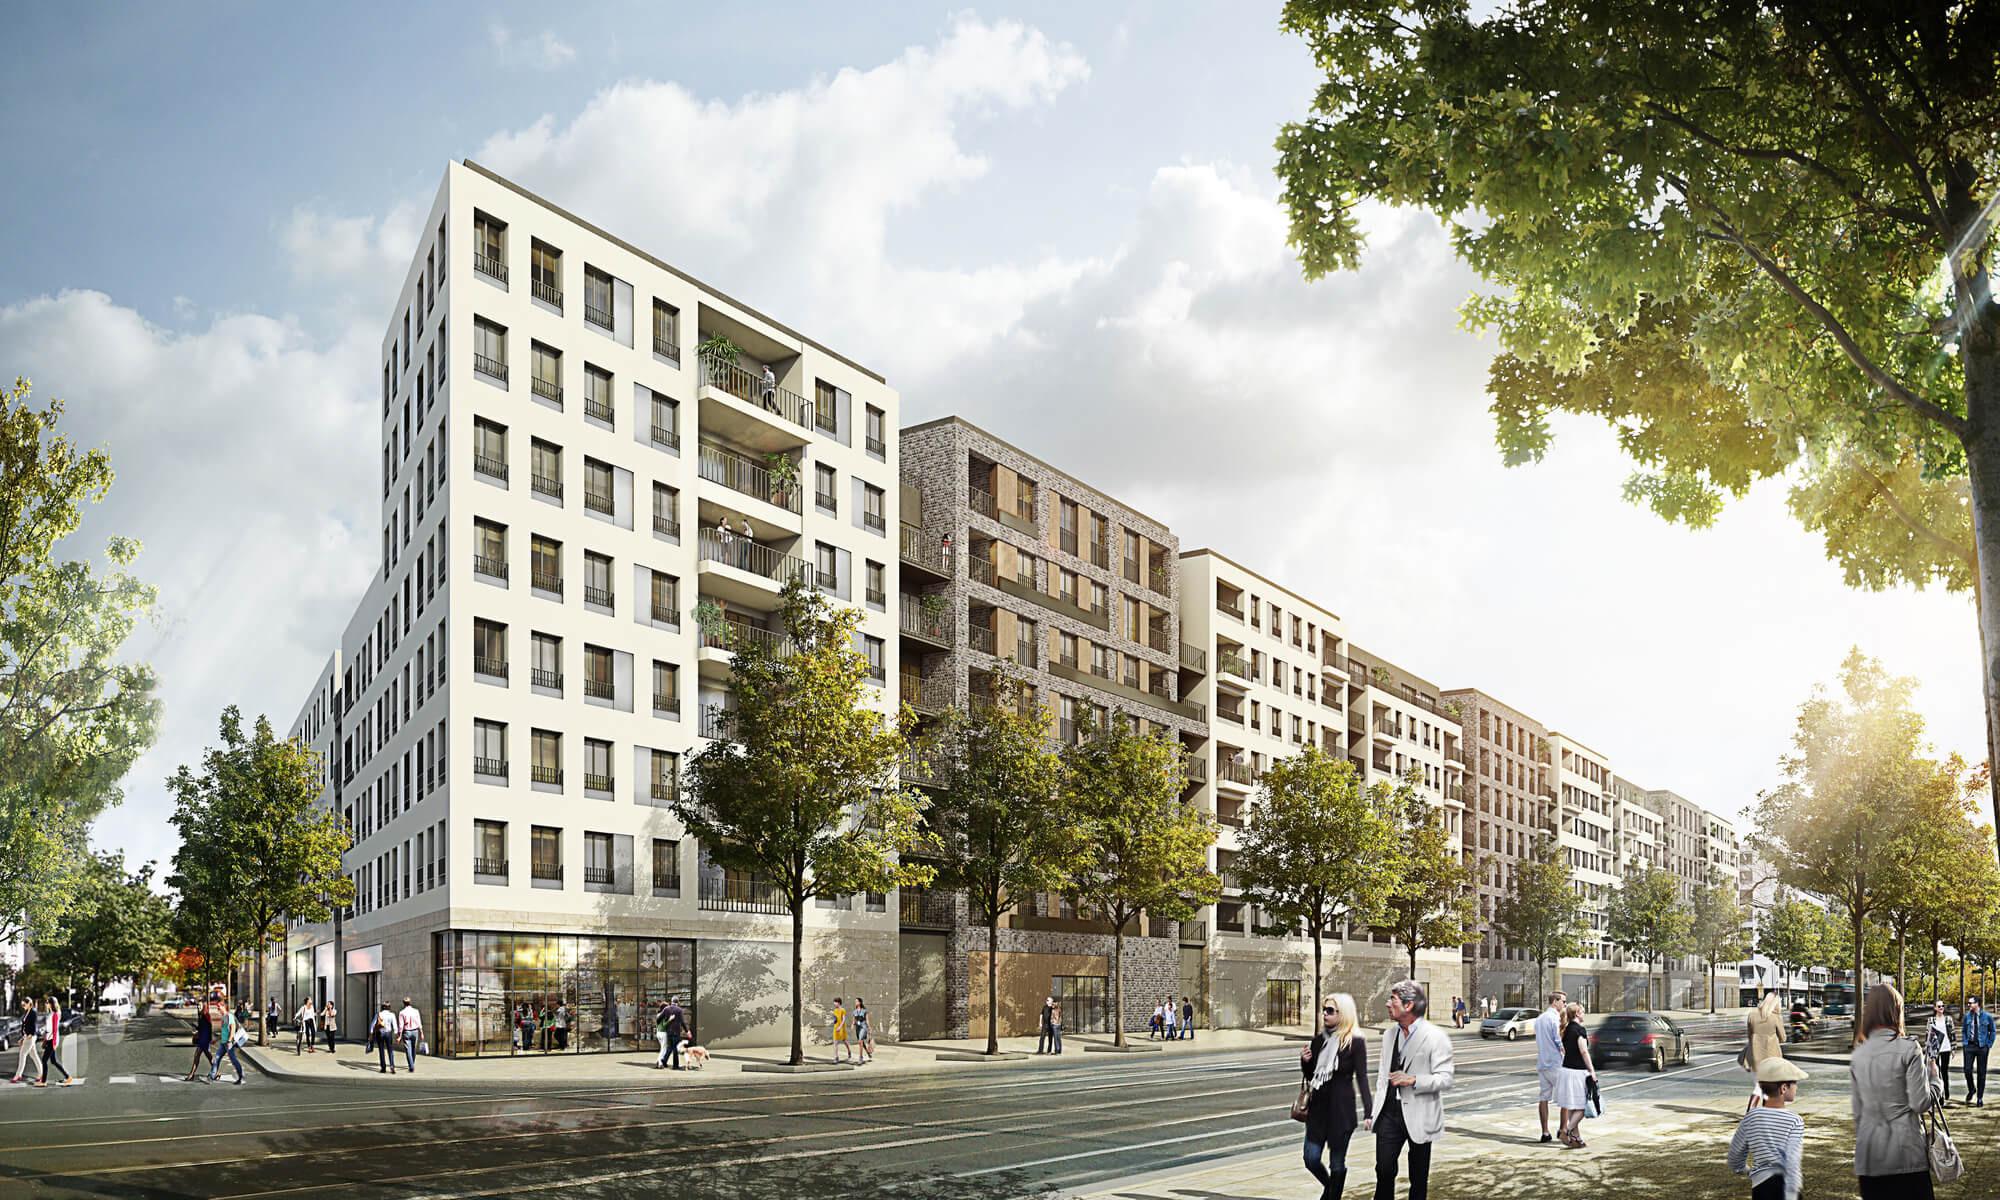 Gwh Frankfurt Wohnung Mieten  Neubau Immobilien Frankfurt am Main Gallus Aktuelle